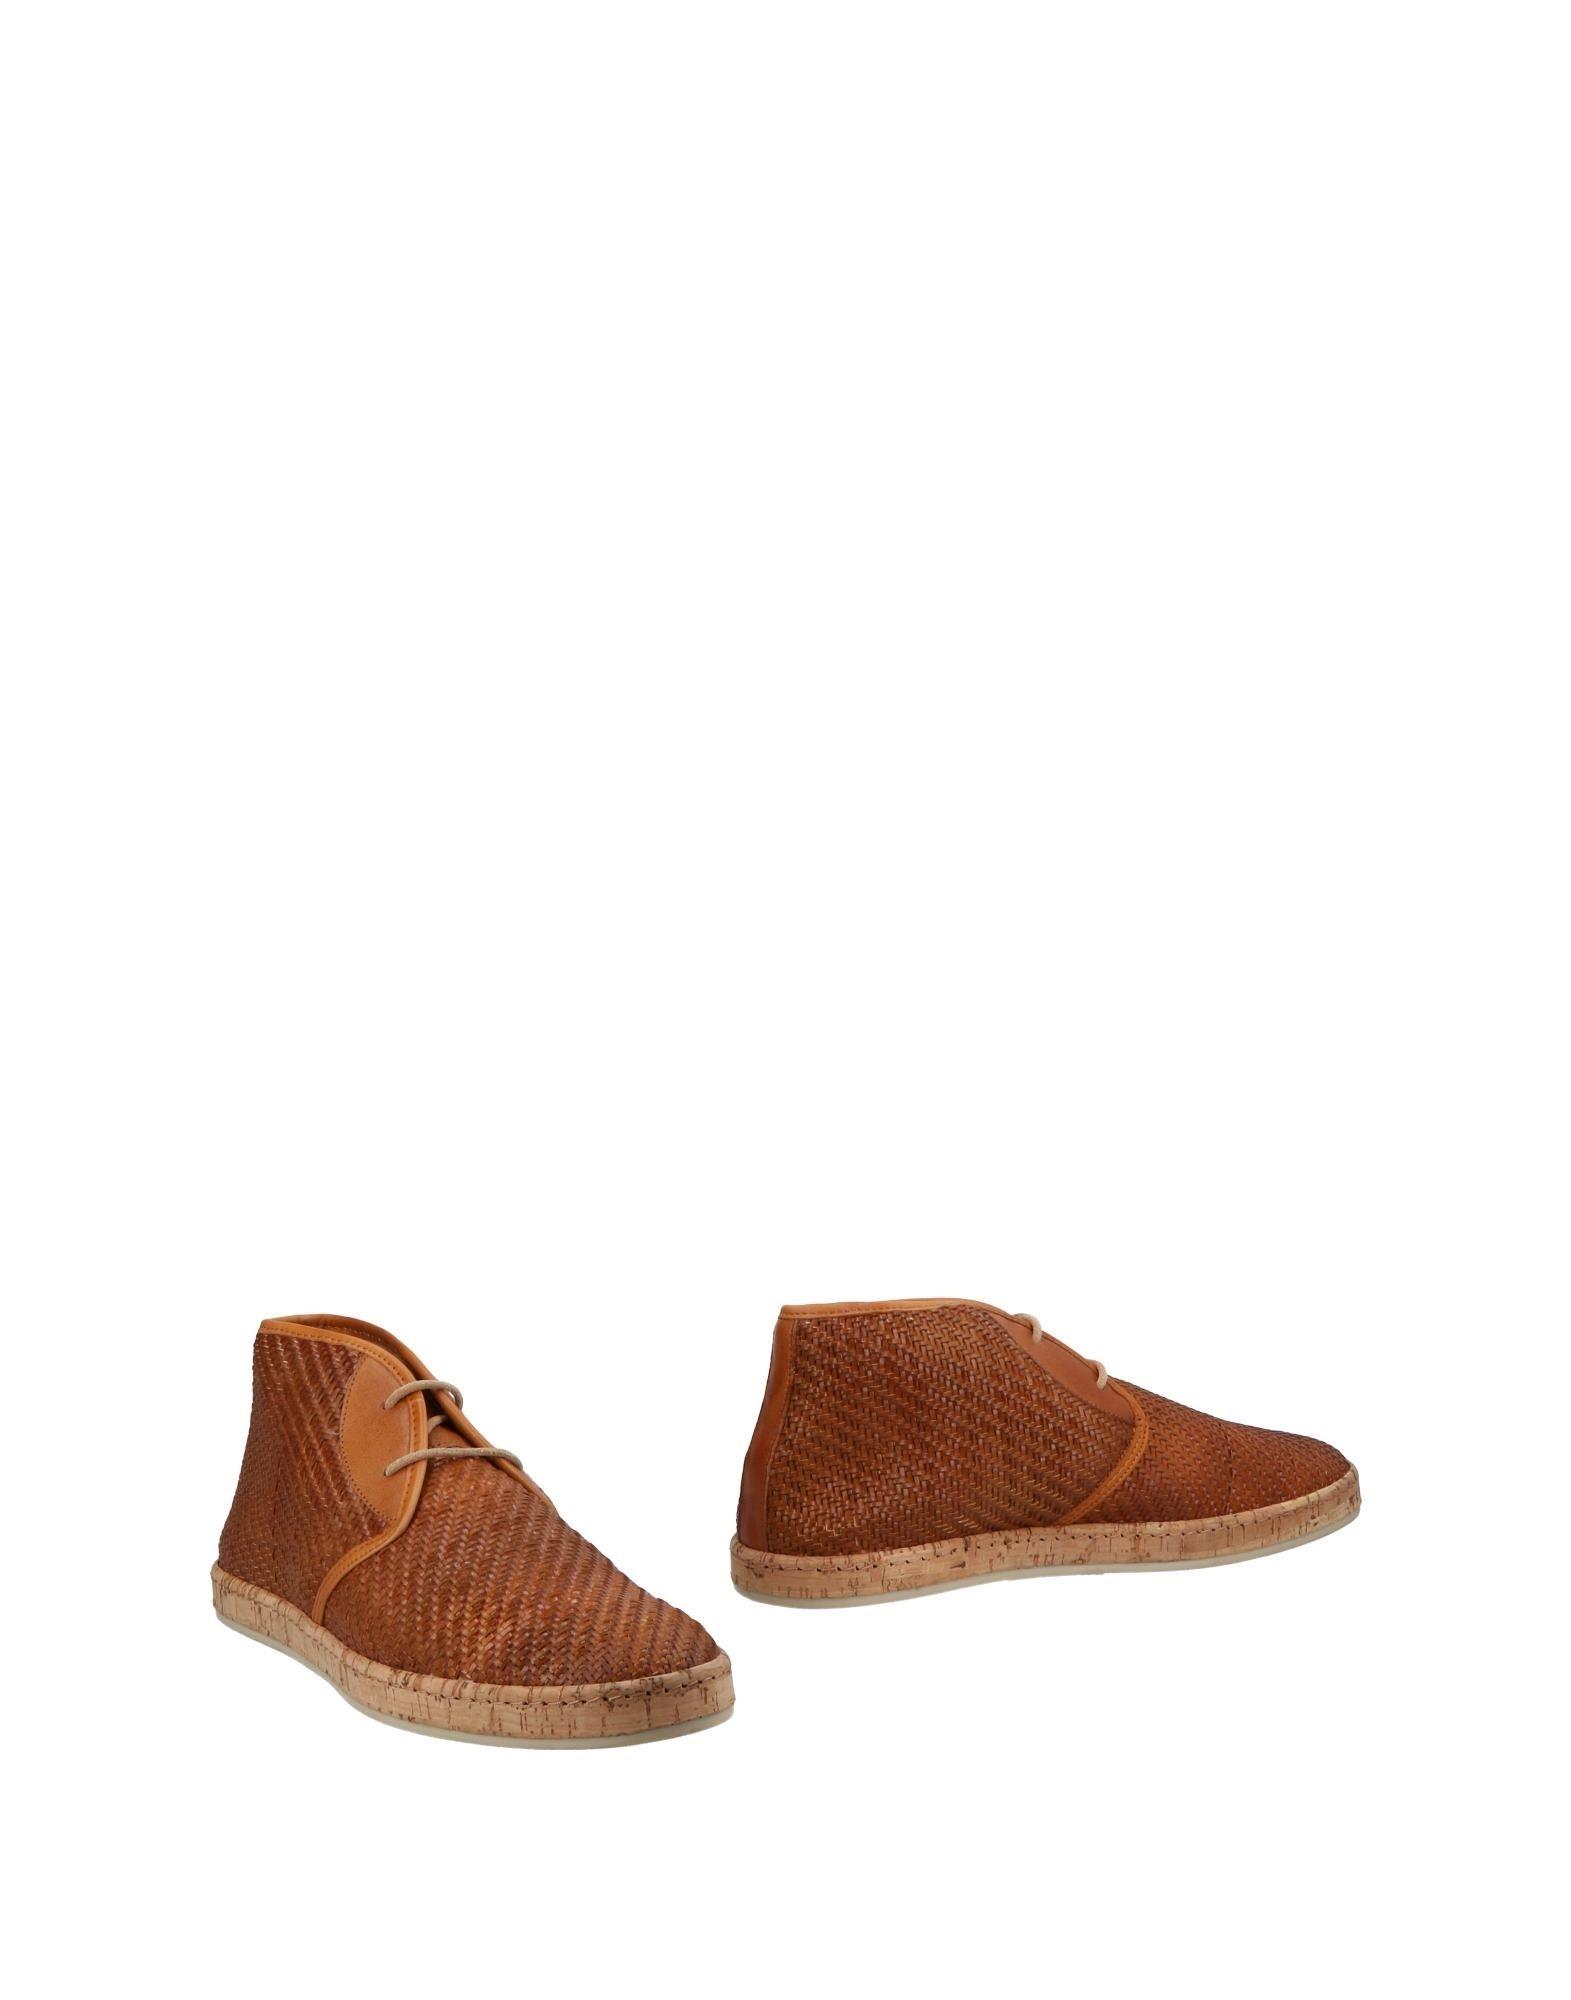 Rabatt Rabatt Rabatt echte Schuhe G 11500258KE 5d2245